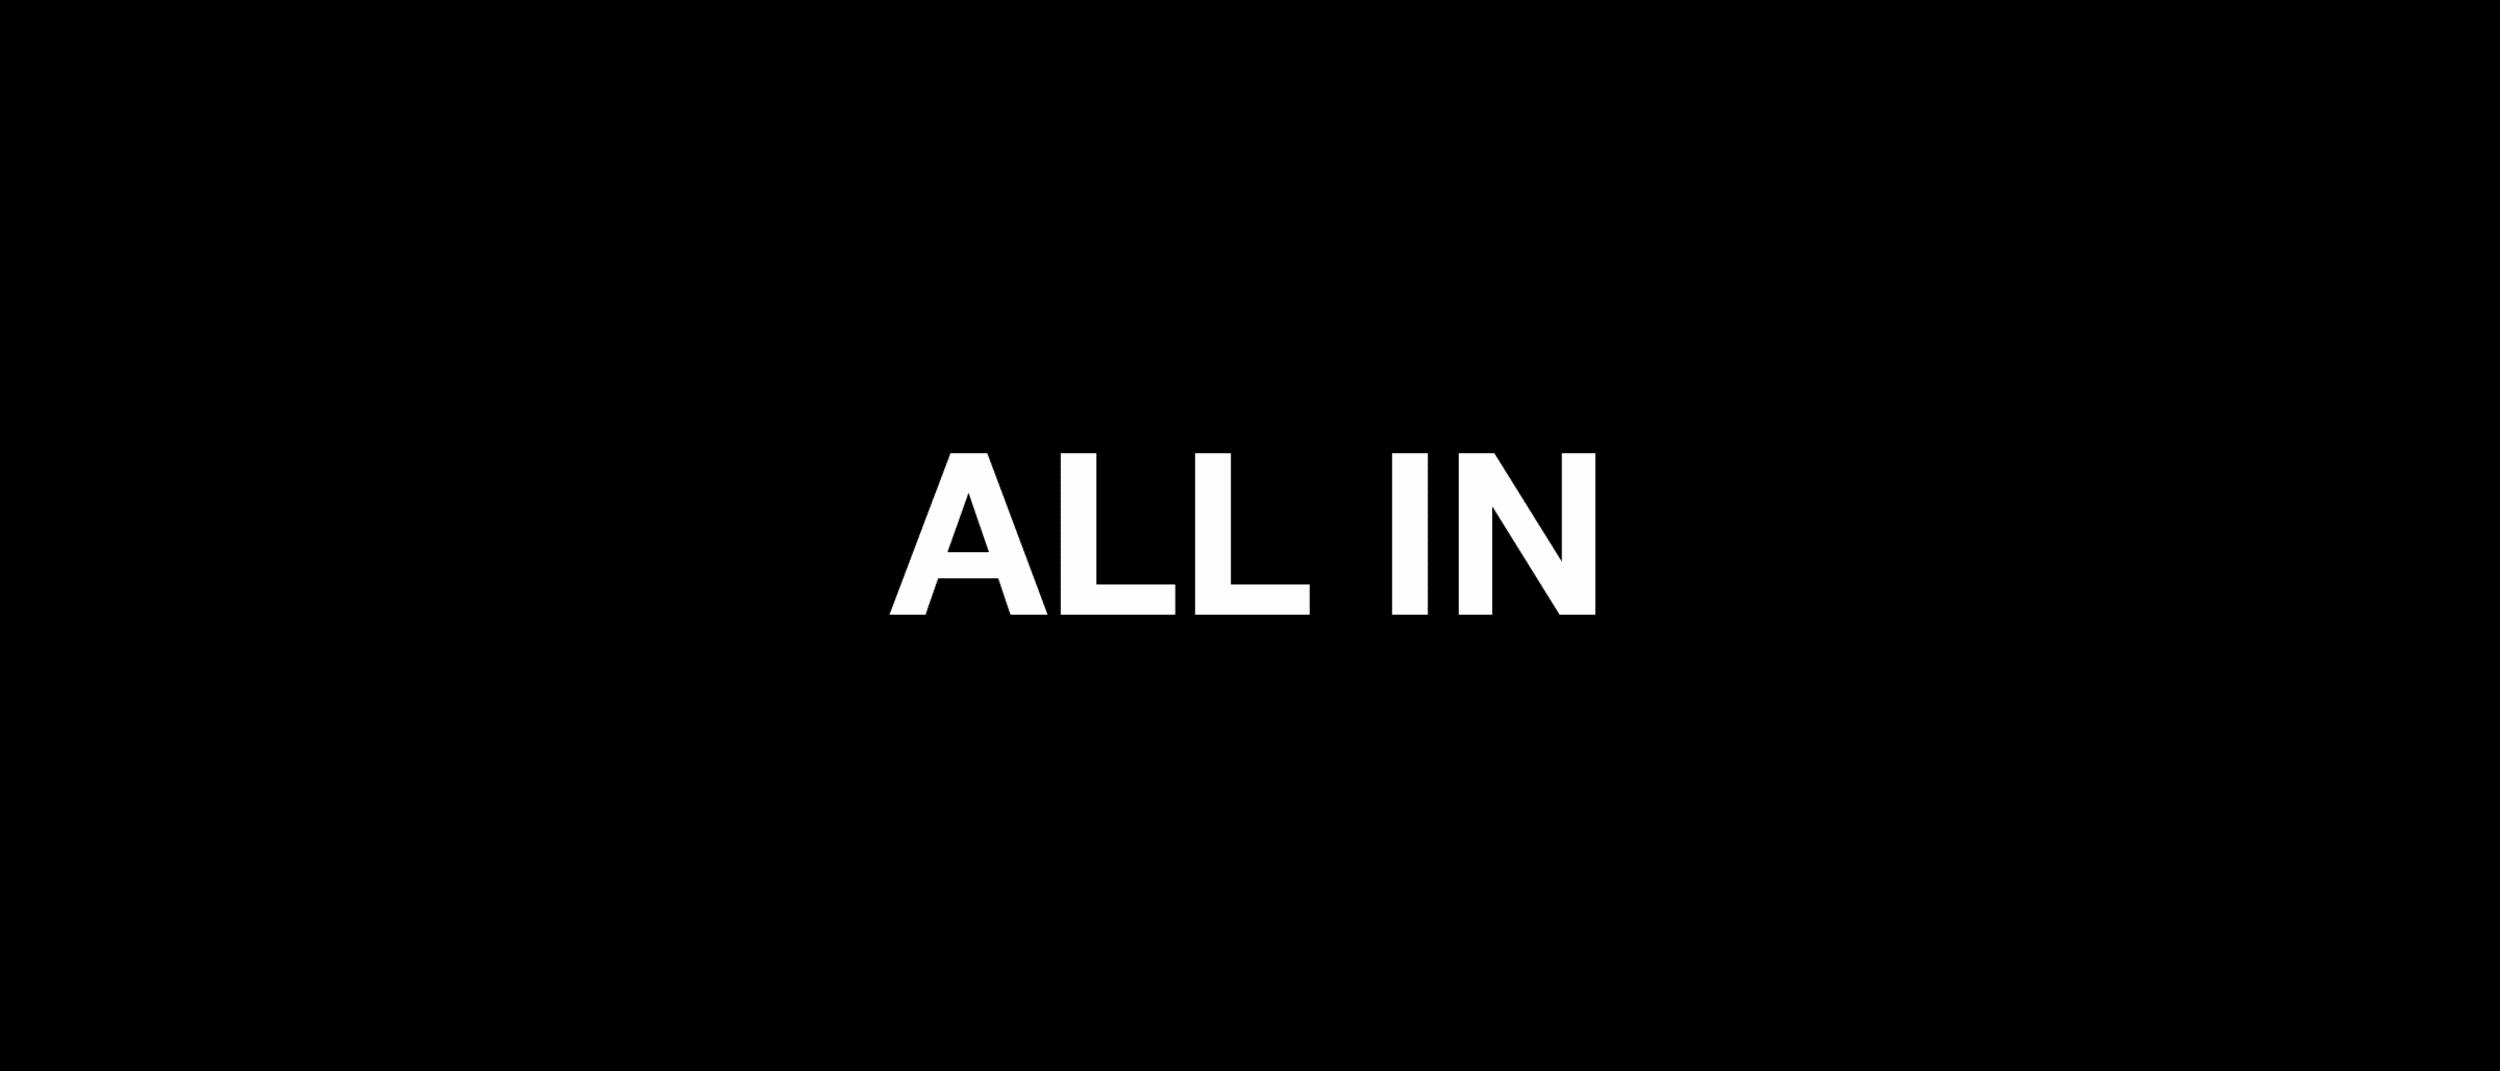 """ALL IN"" - Retailers Unite"